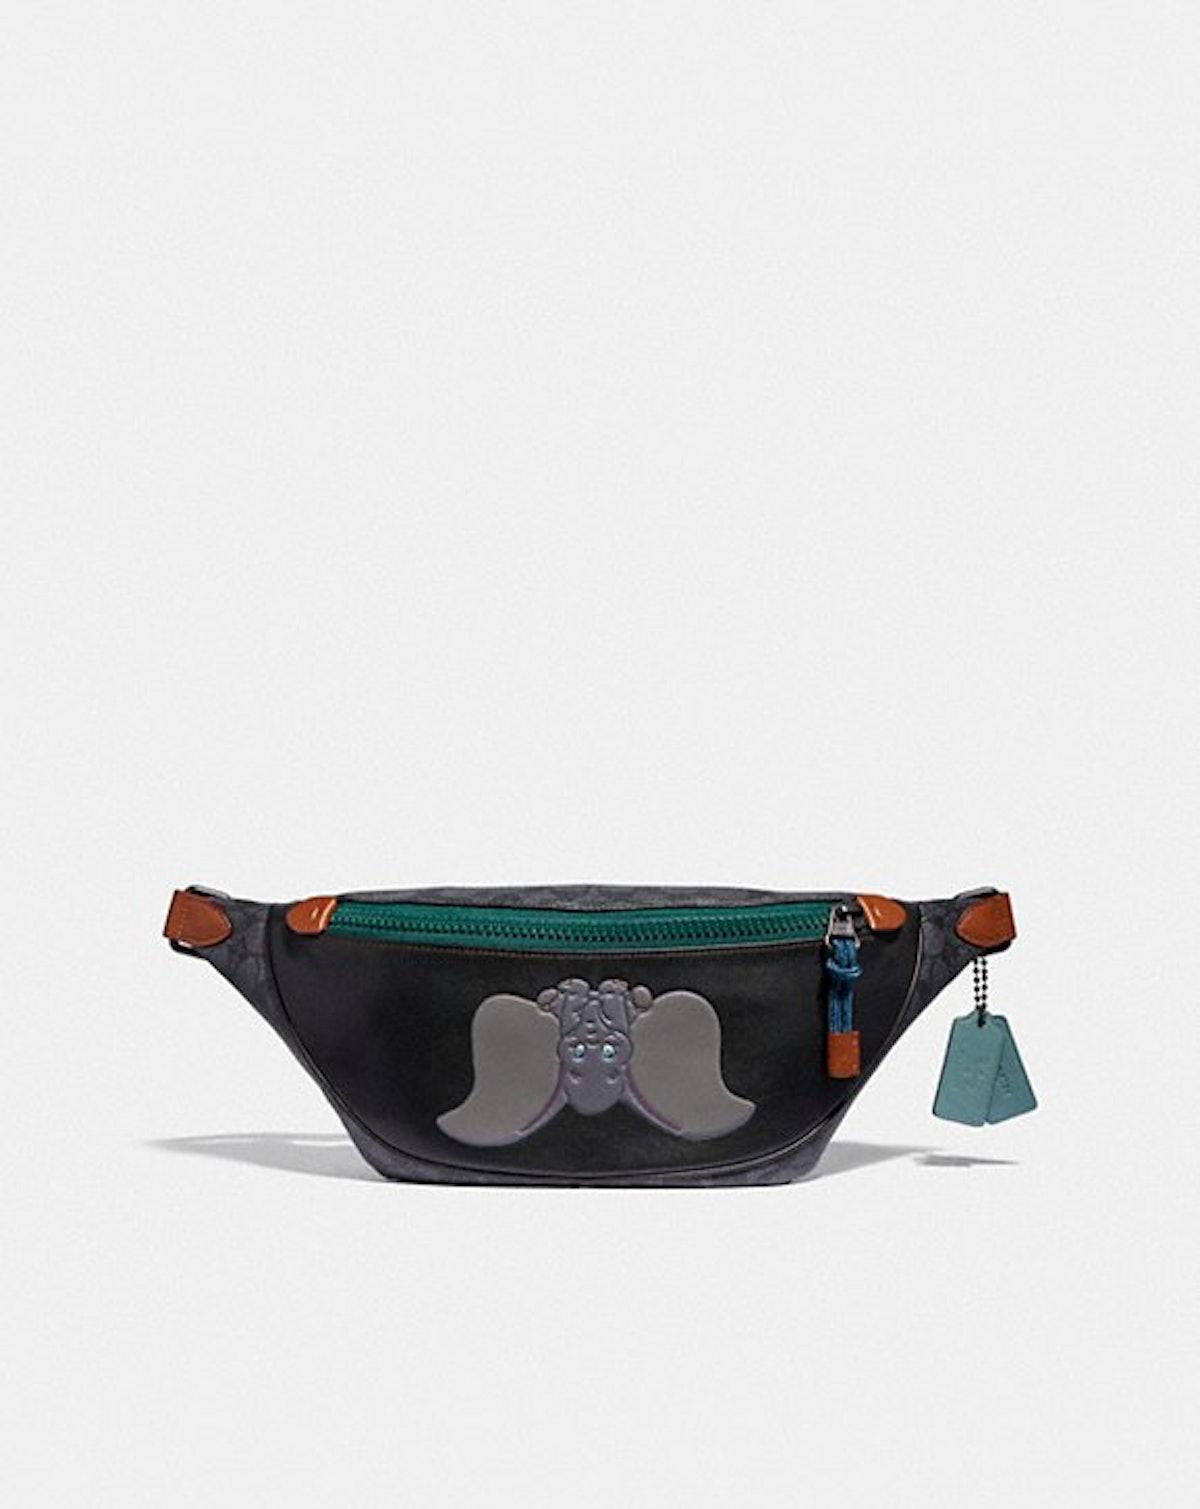 Disney X Coach Signature Rivington Belt Bag With Dumbo